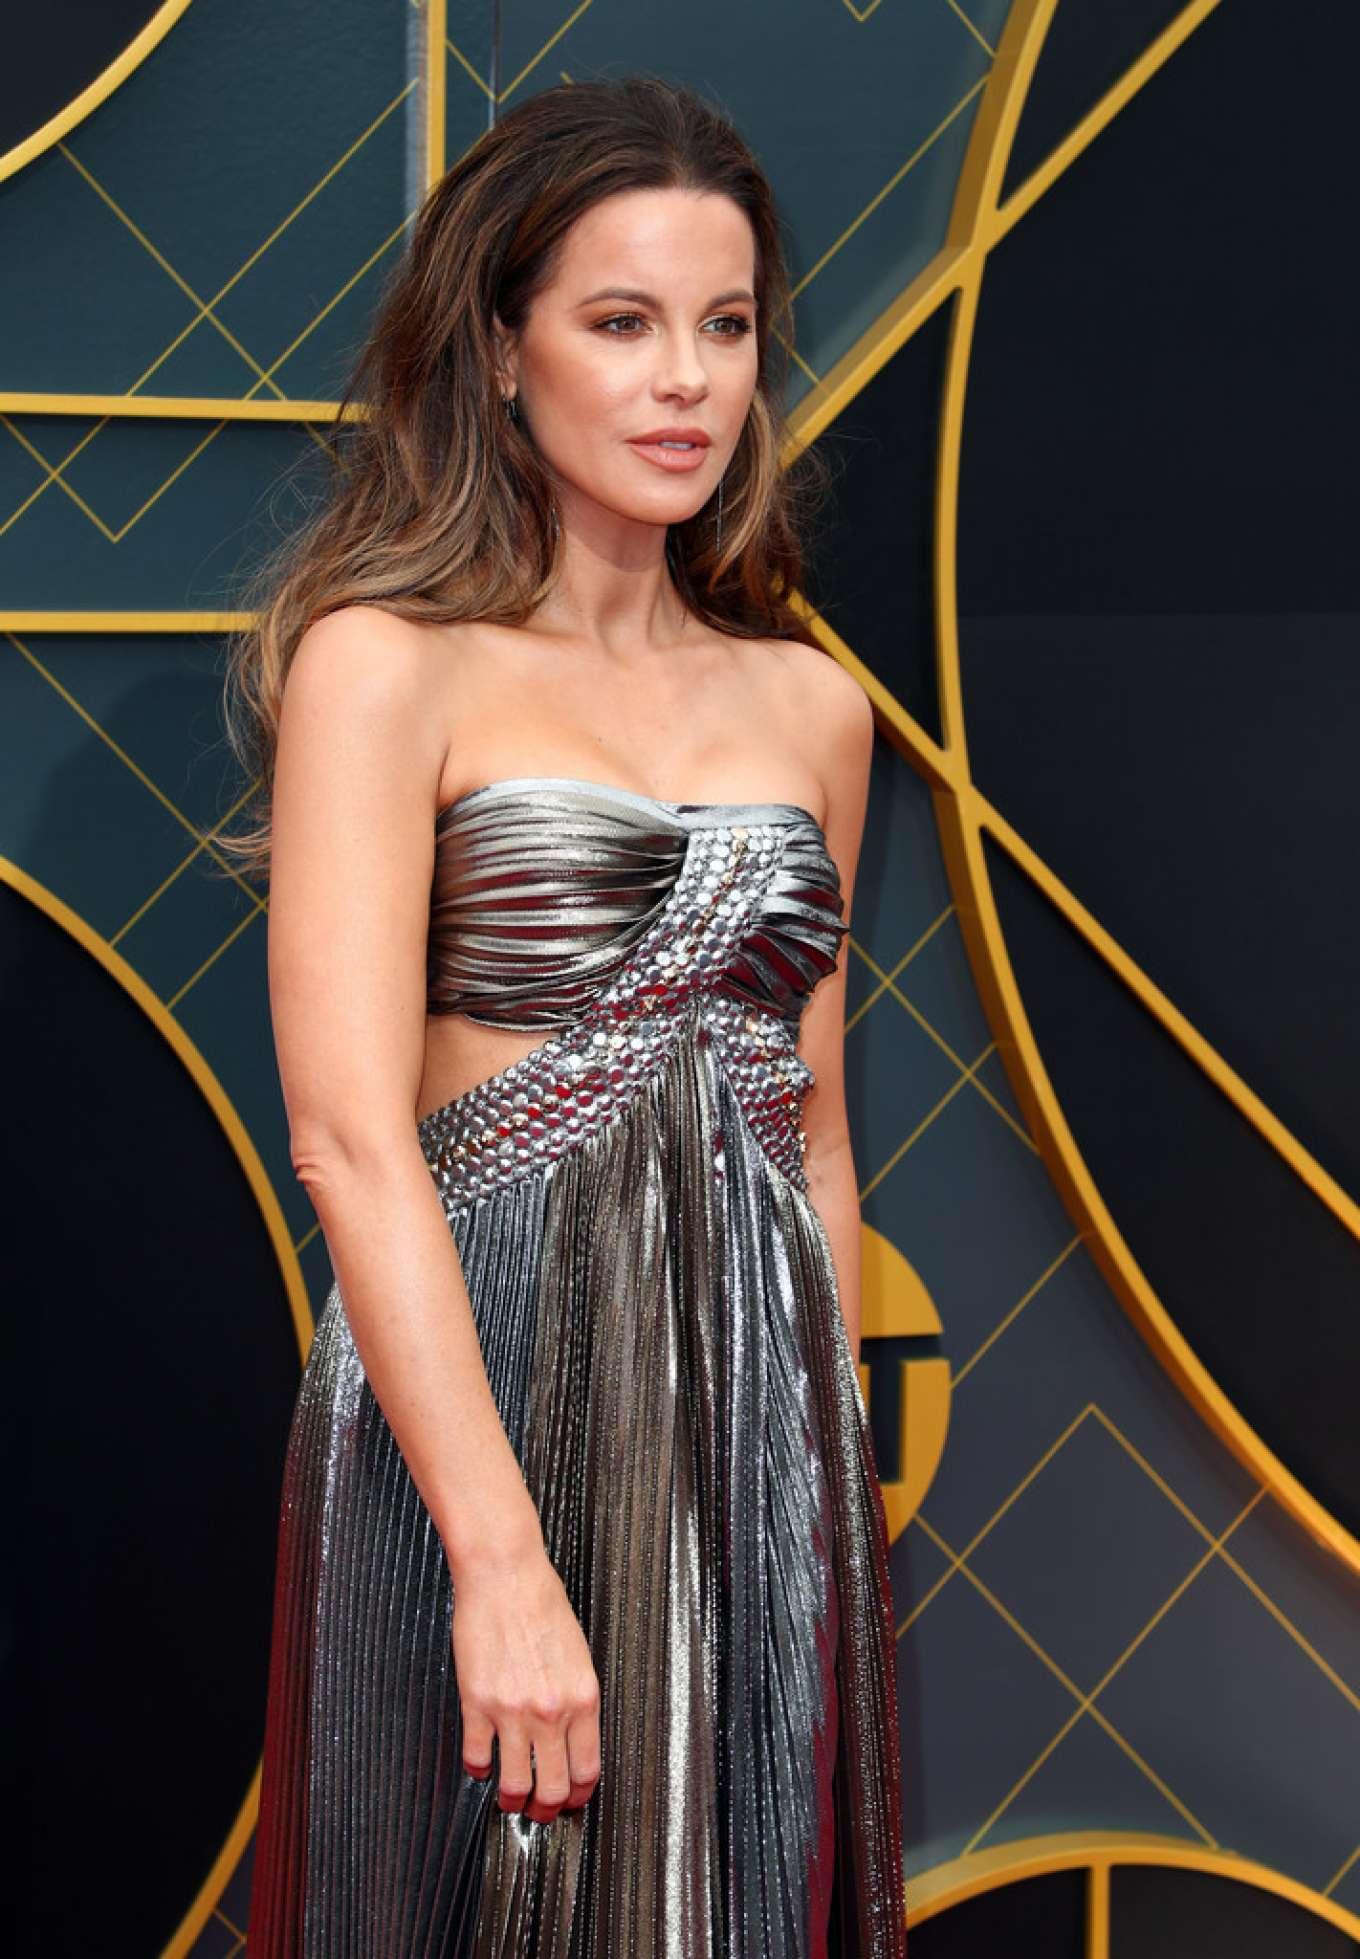 Kate Beckinsale 2019 Nba Awards In Santa Monica Gotceleb